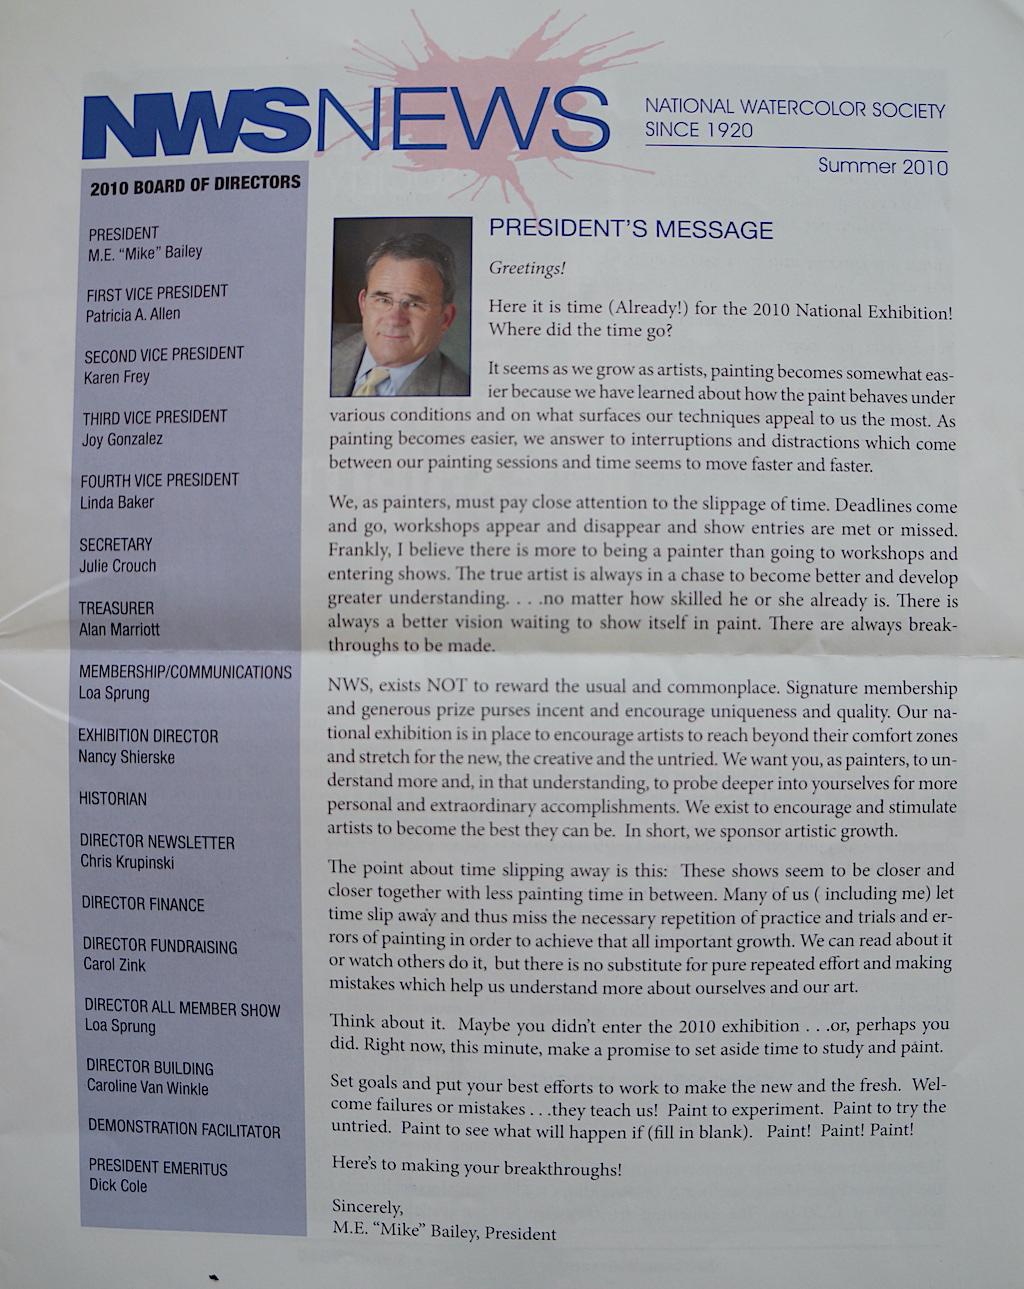 NWS News Summer 2010-01